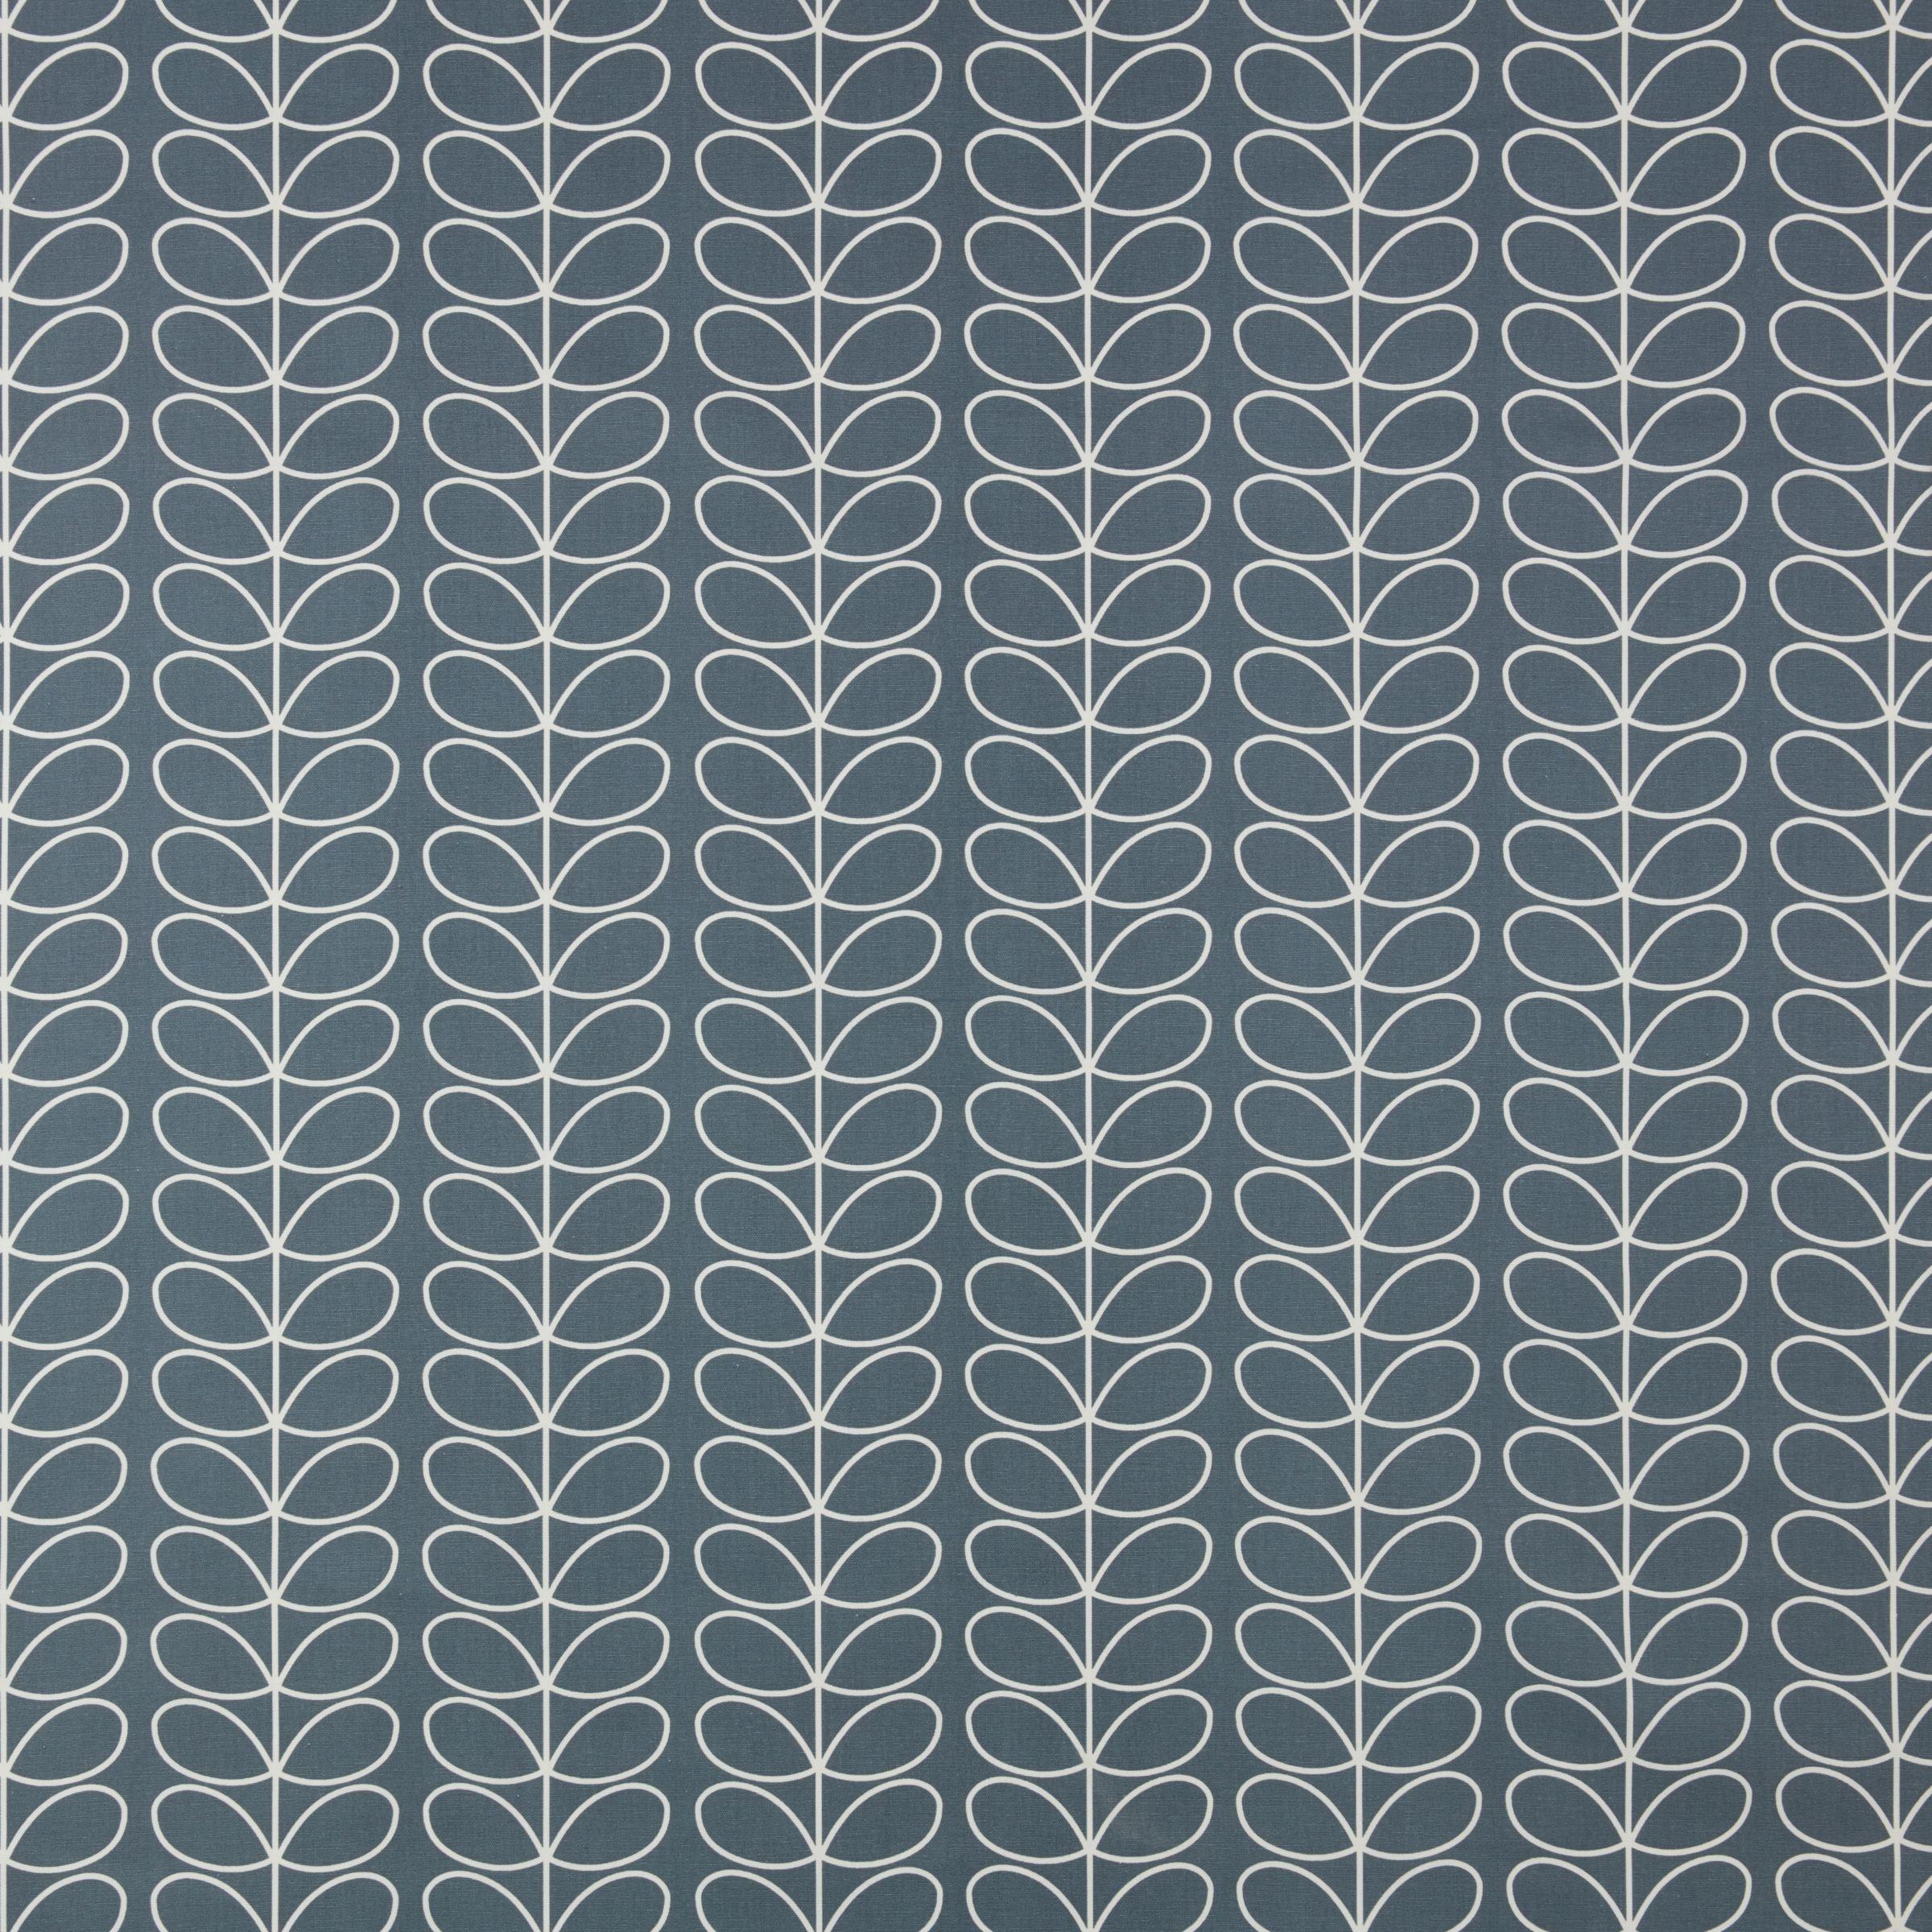 Orla Kiely Linear Stem PVC Tablecloth Fabric